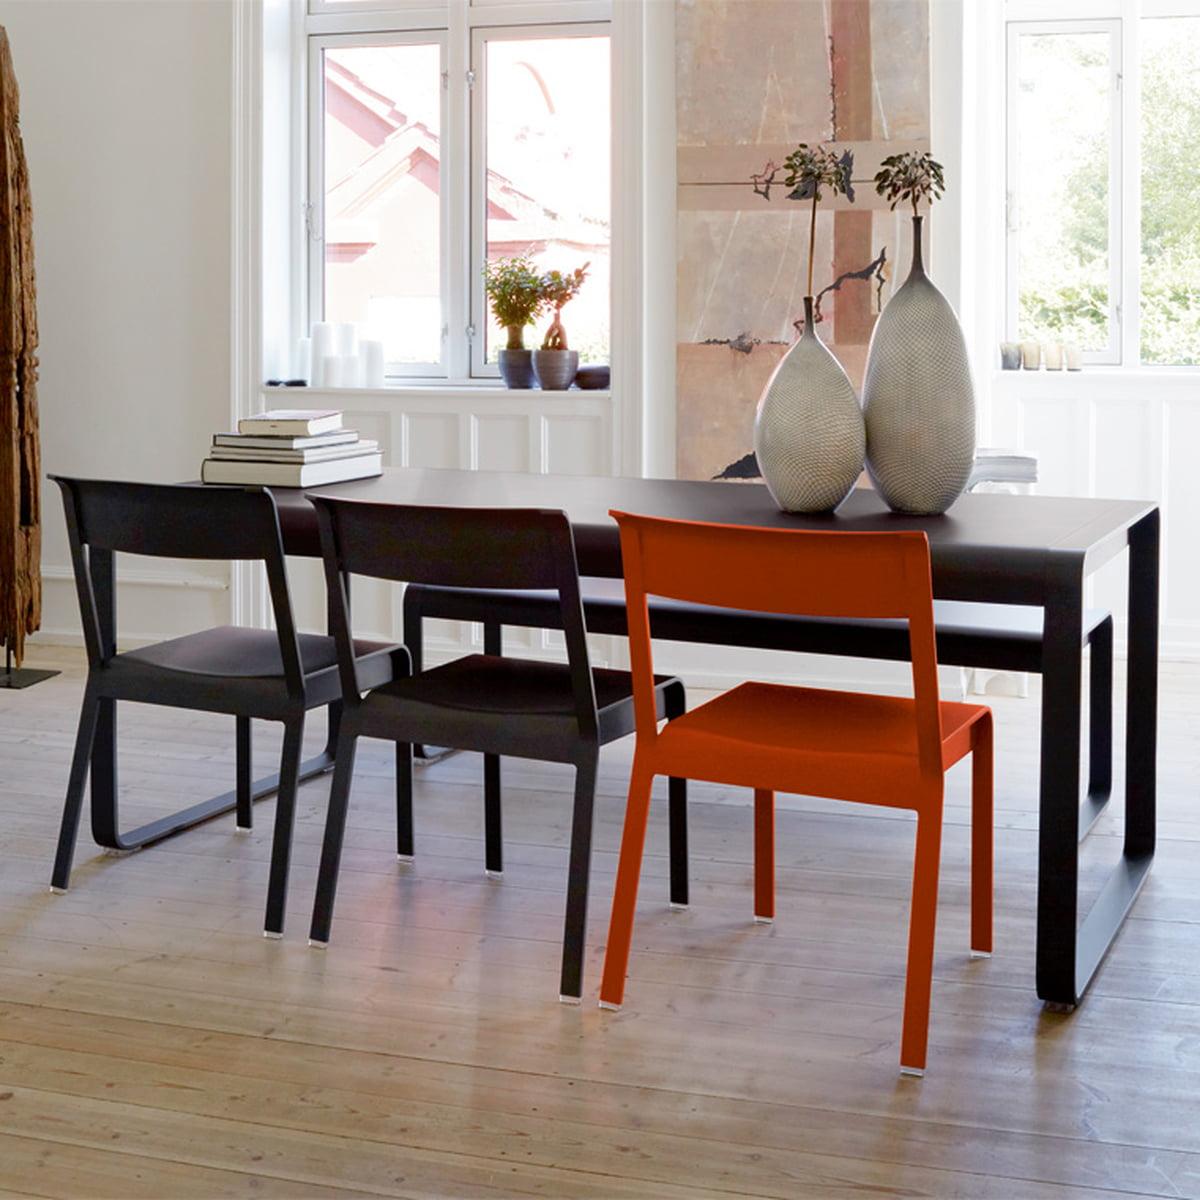 fermob tisch top fermob tables u bordeaux with fermob. Black Bedroom Furniture Sets. Home Design Ideas